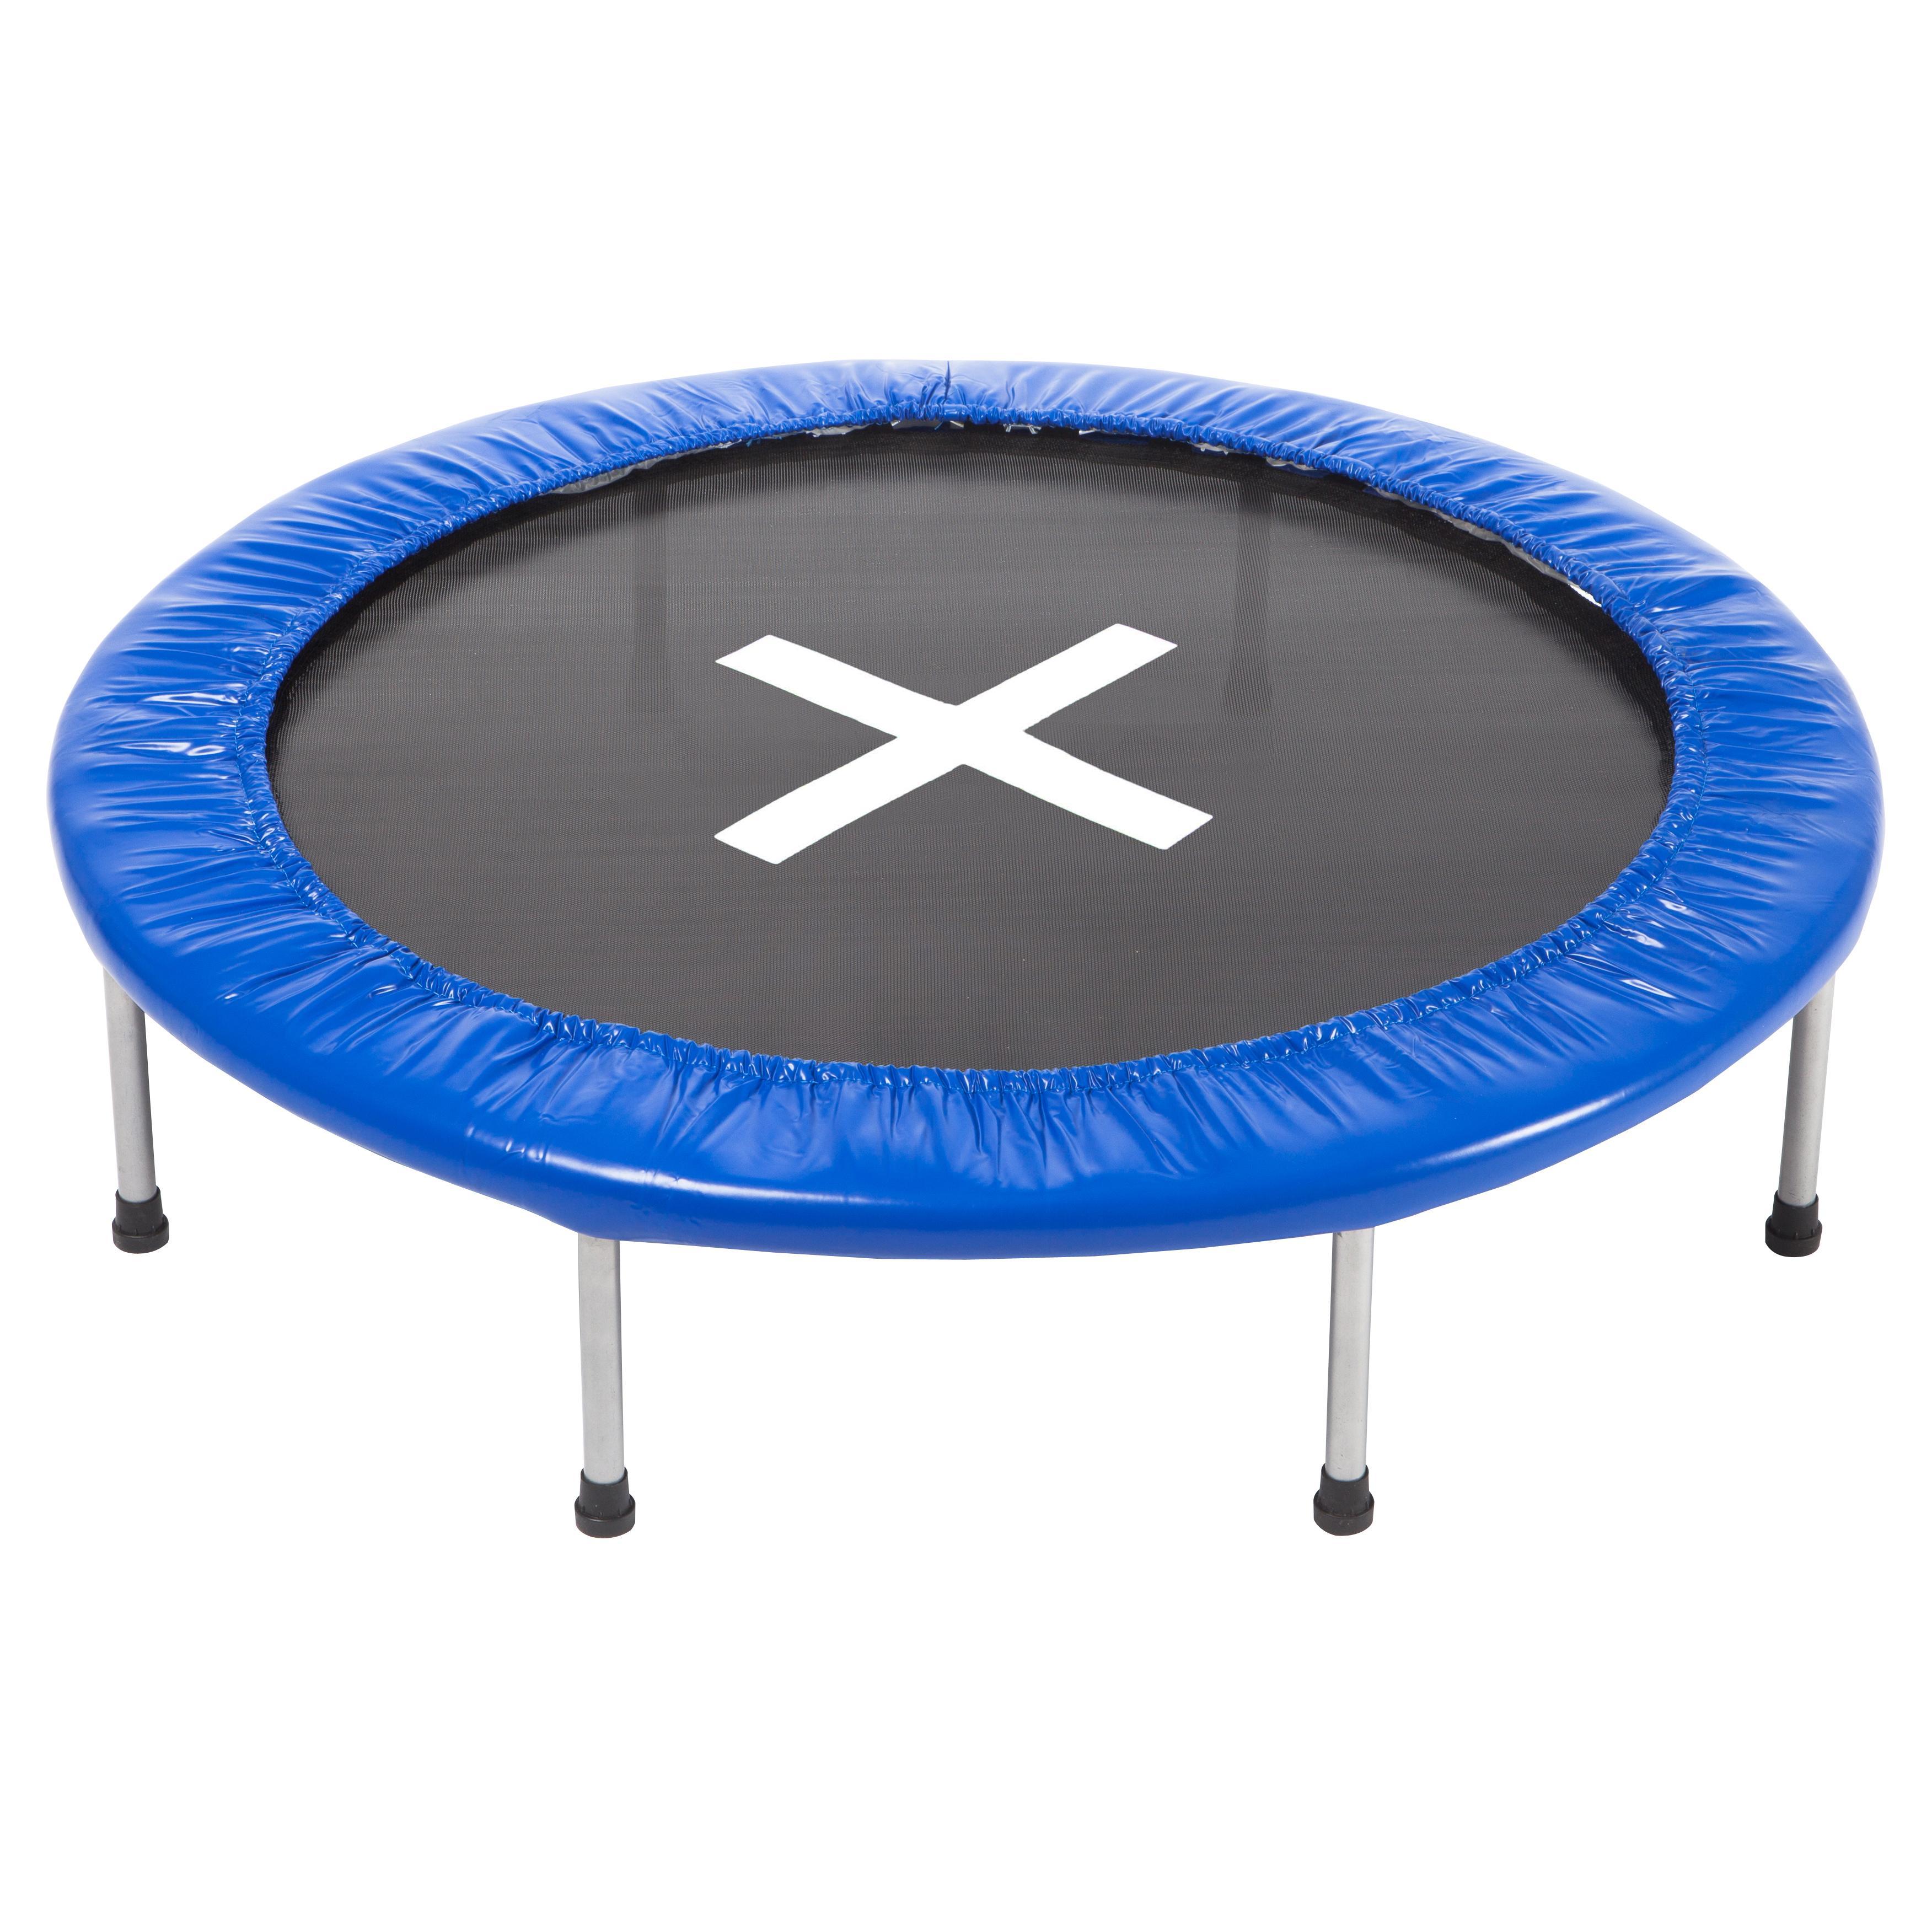 ultrasport trampolin jumper 120 cm vielseitiges minitrampolin f r kinder und erwachsene ideal. Black Bedroom Furniture Sets. Home Design Ideas